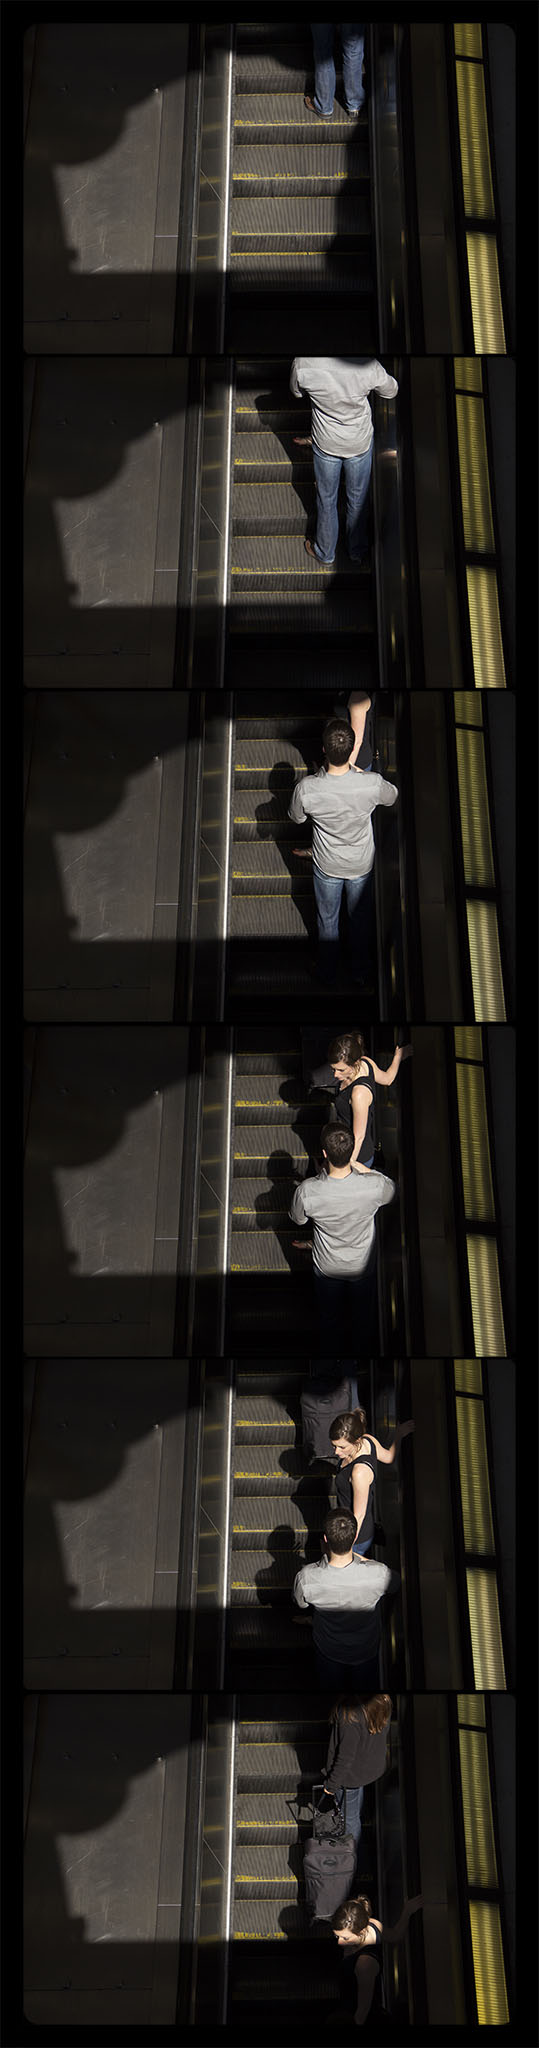 Metro Rail, Gallery Place-Chinatown,  4-21-2012-6247-6256